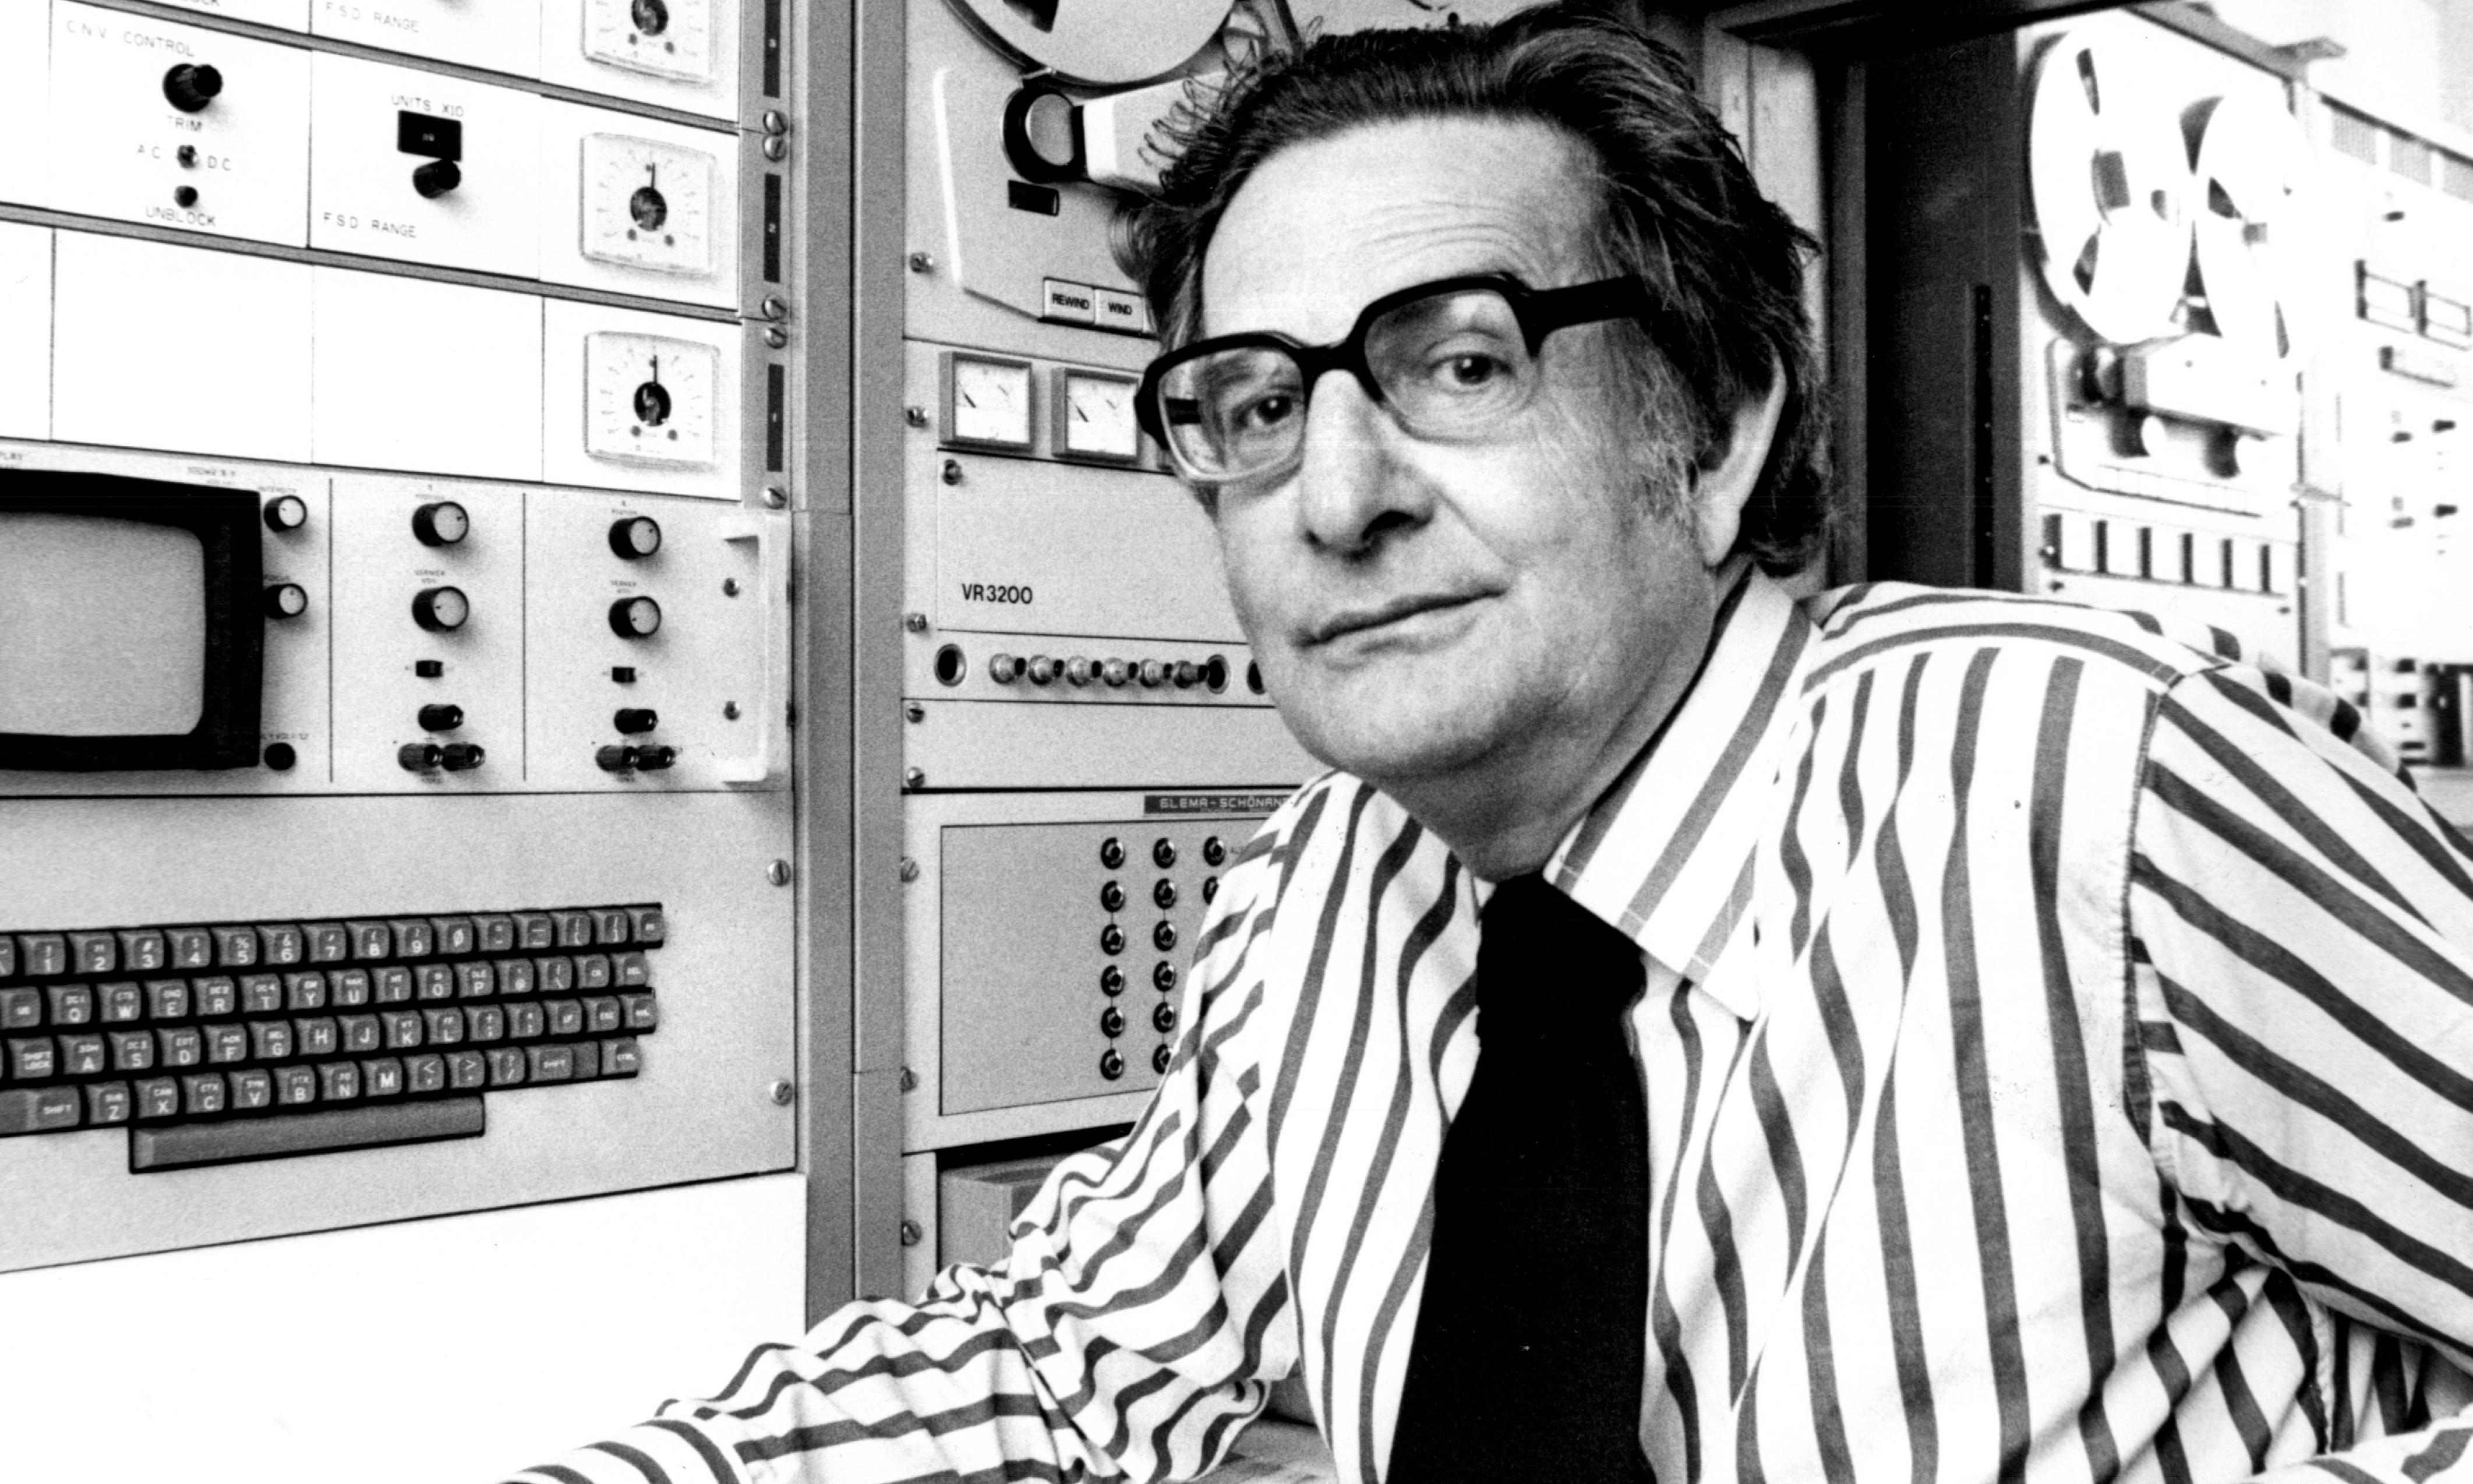 Work of renowned UK psychologist Hans Eysenck ruled 'unsafe'